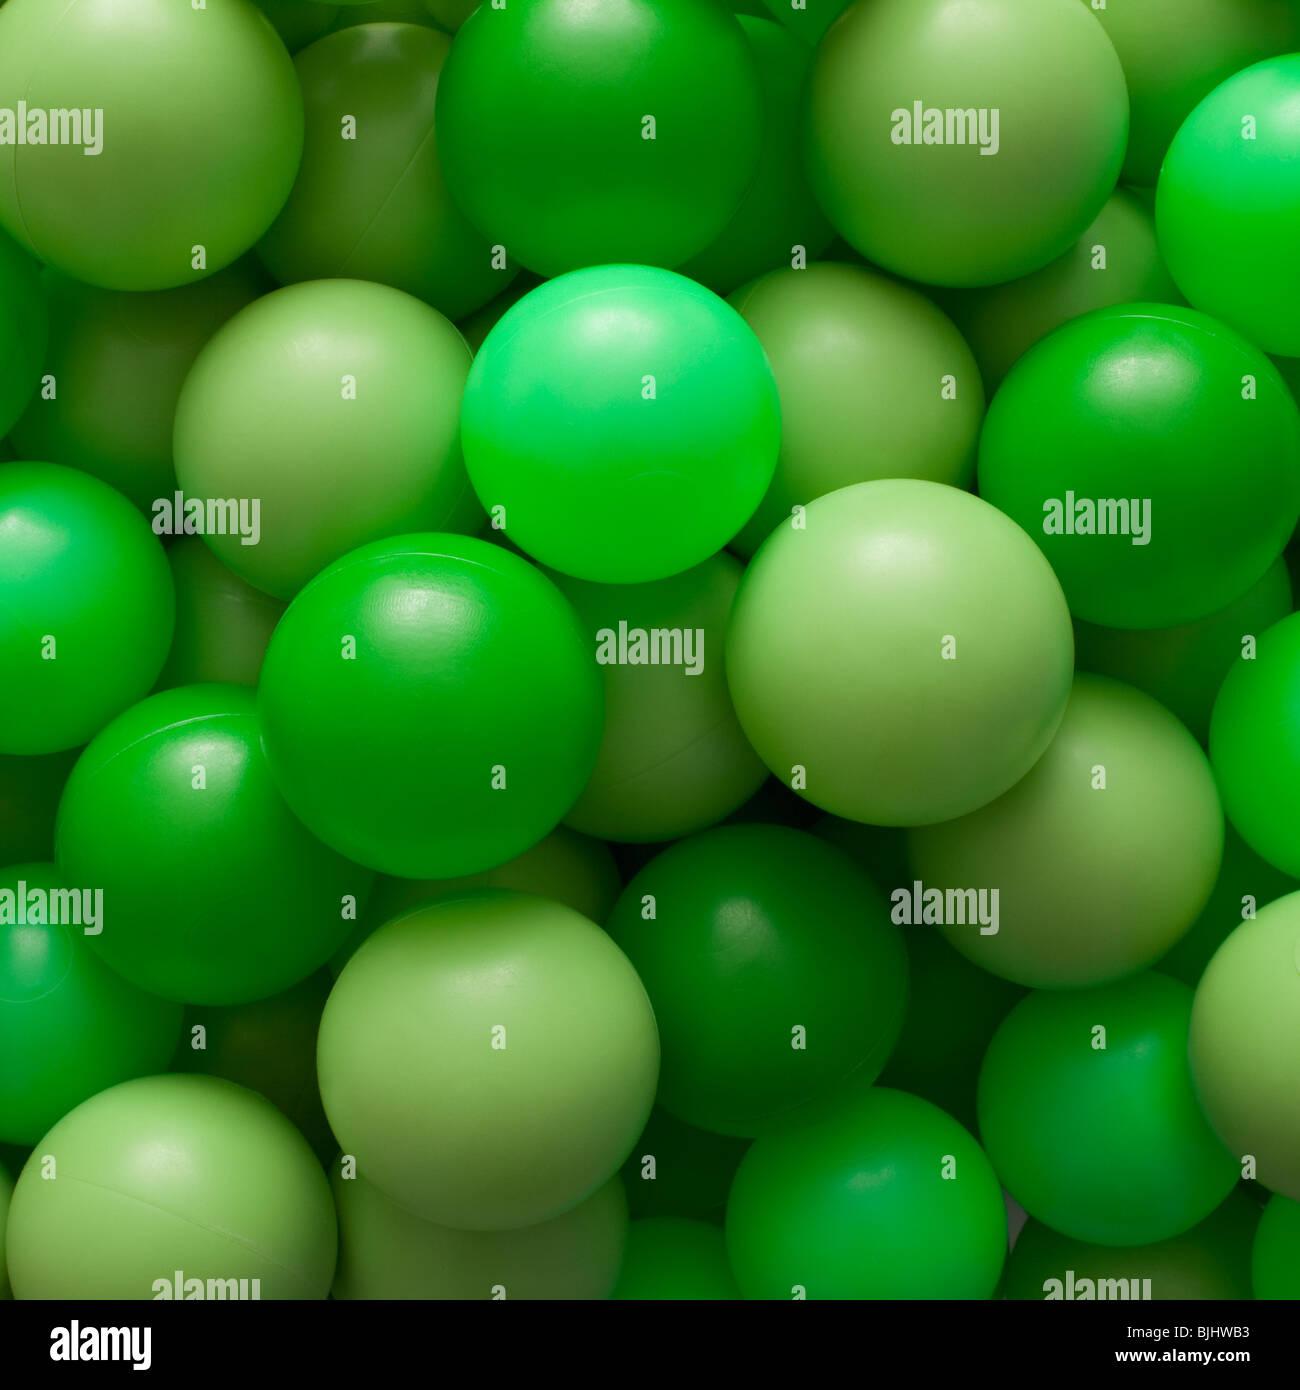 Grüne Kugeln Stockbild